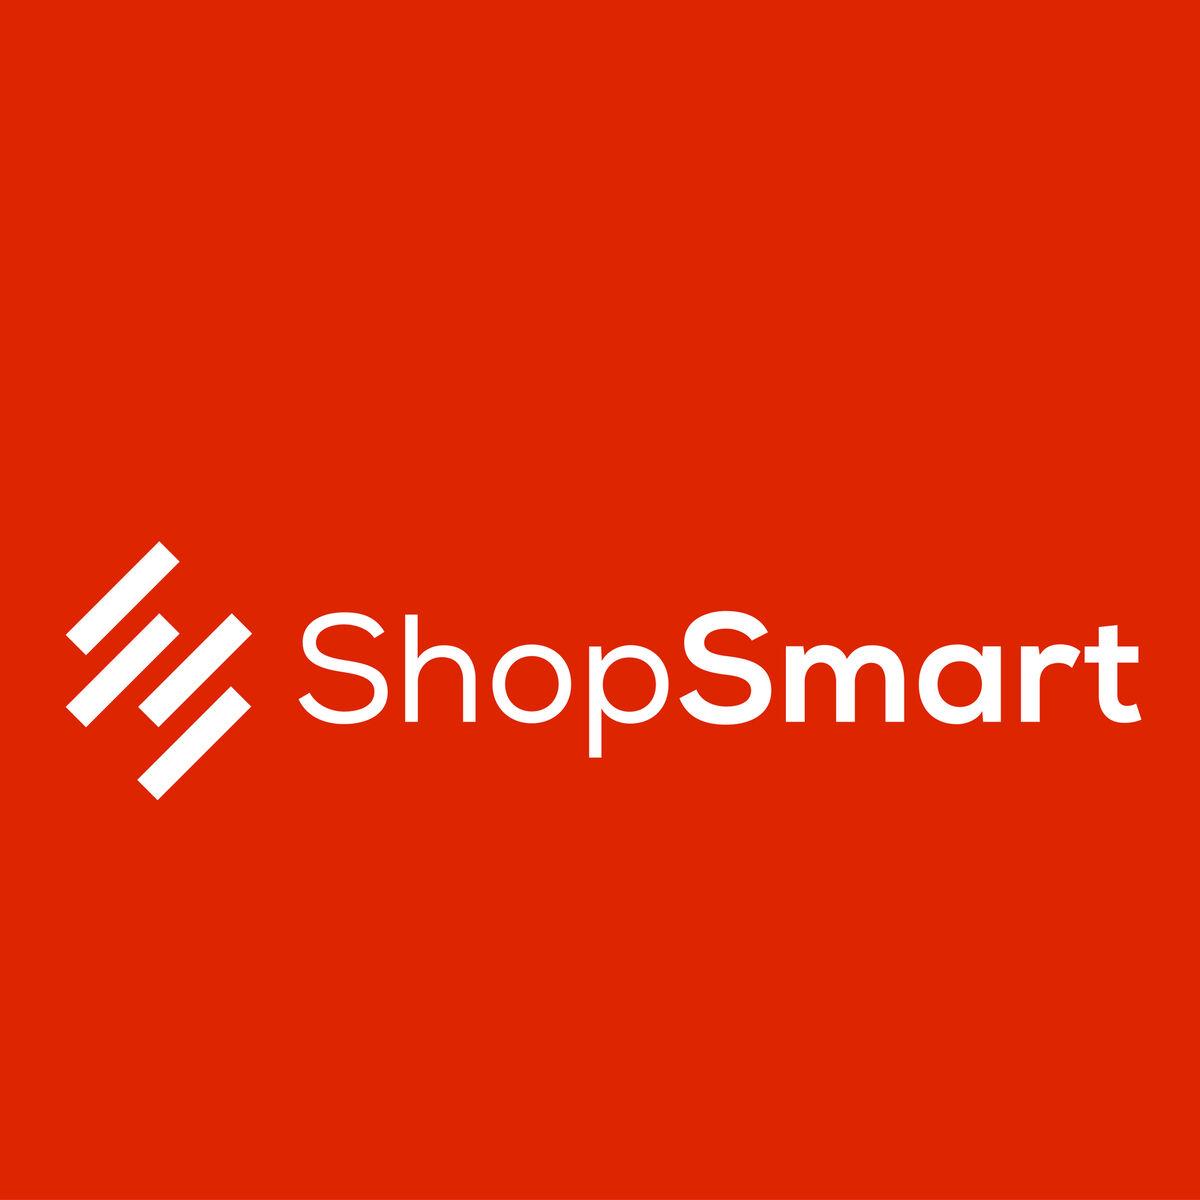 ShopSmart Discount Stores